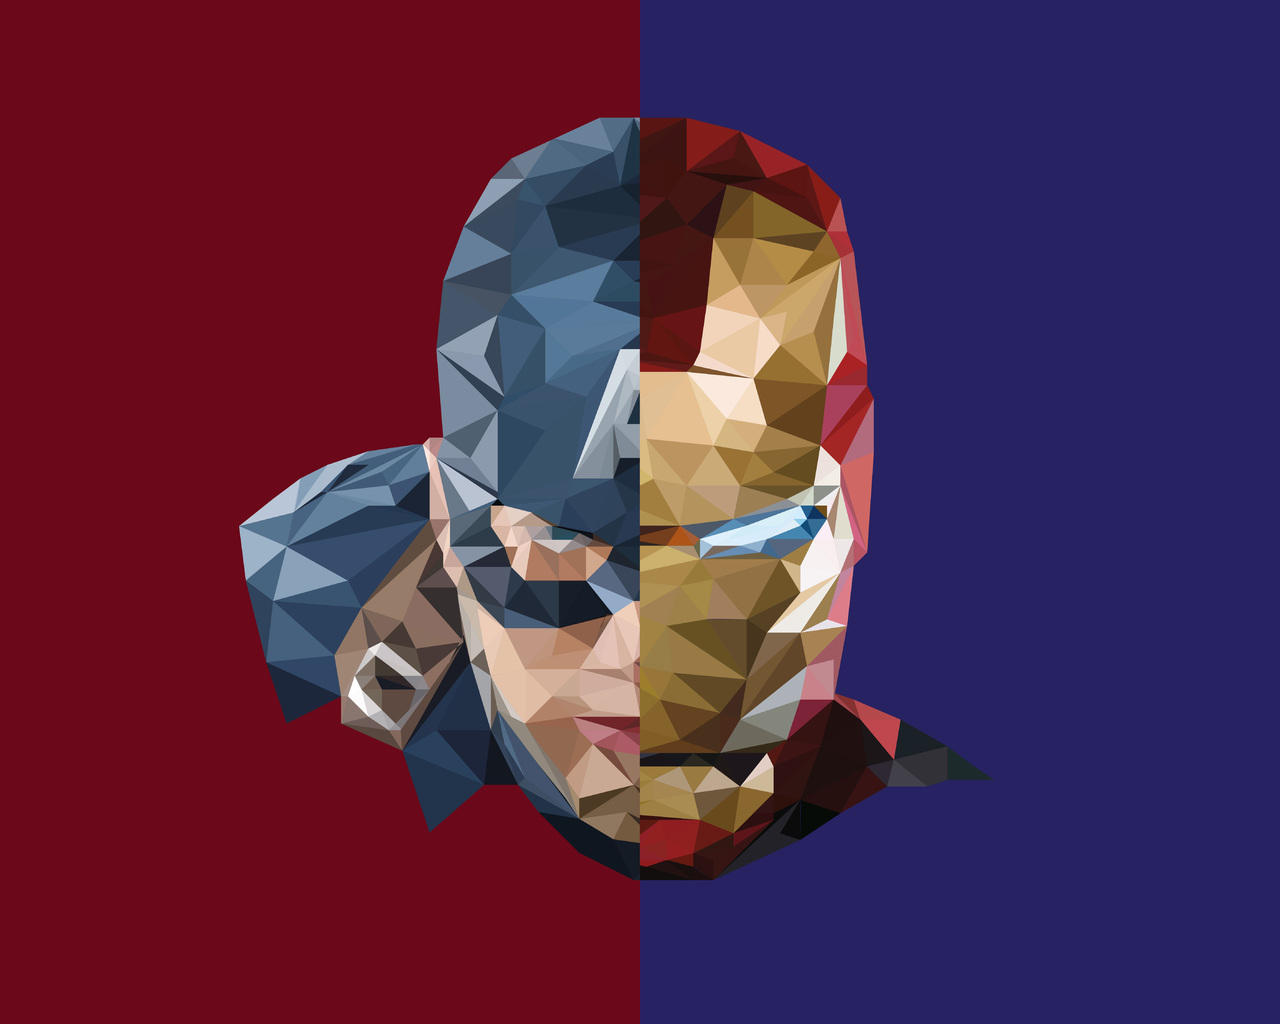 iron-man-captain-america-abstract-py.jpg